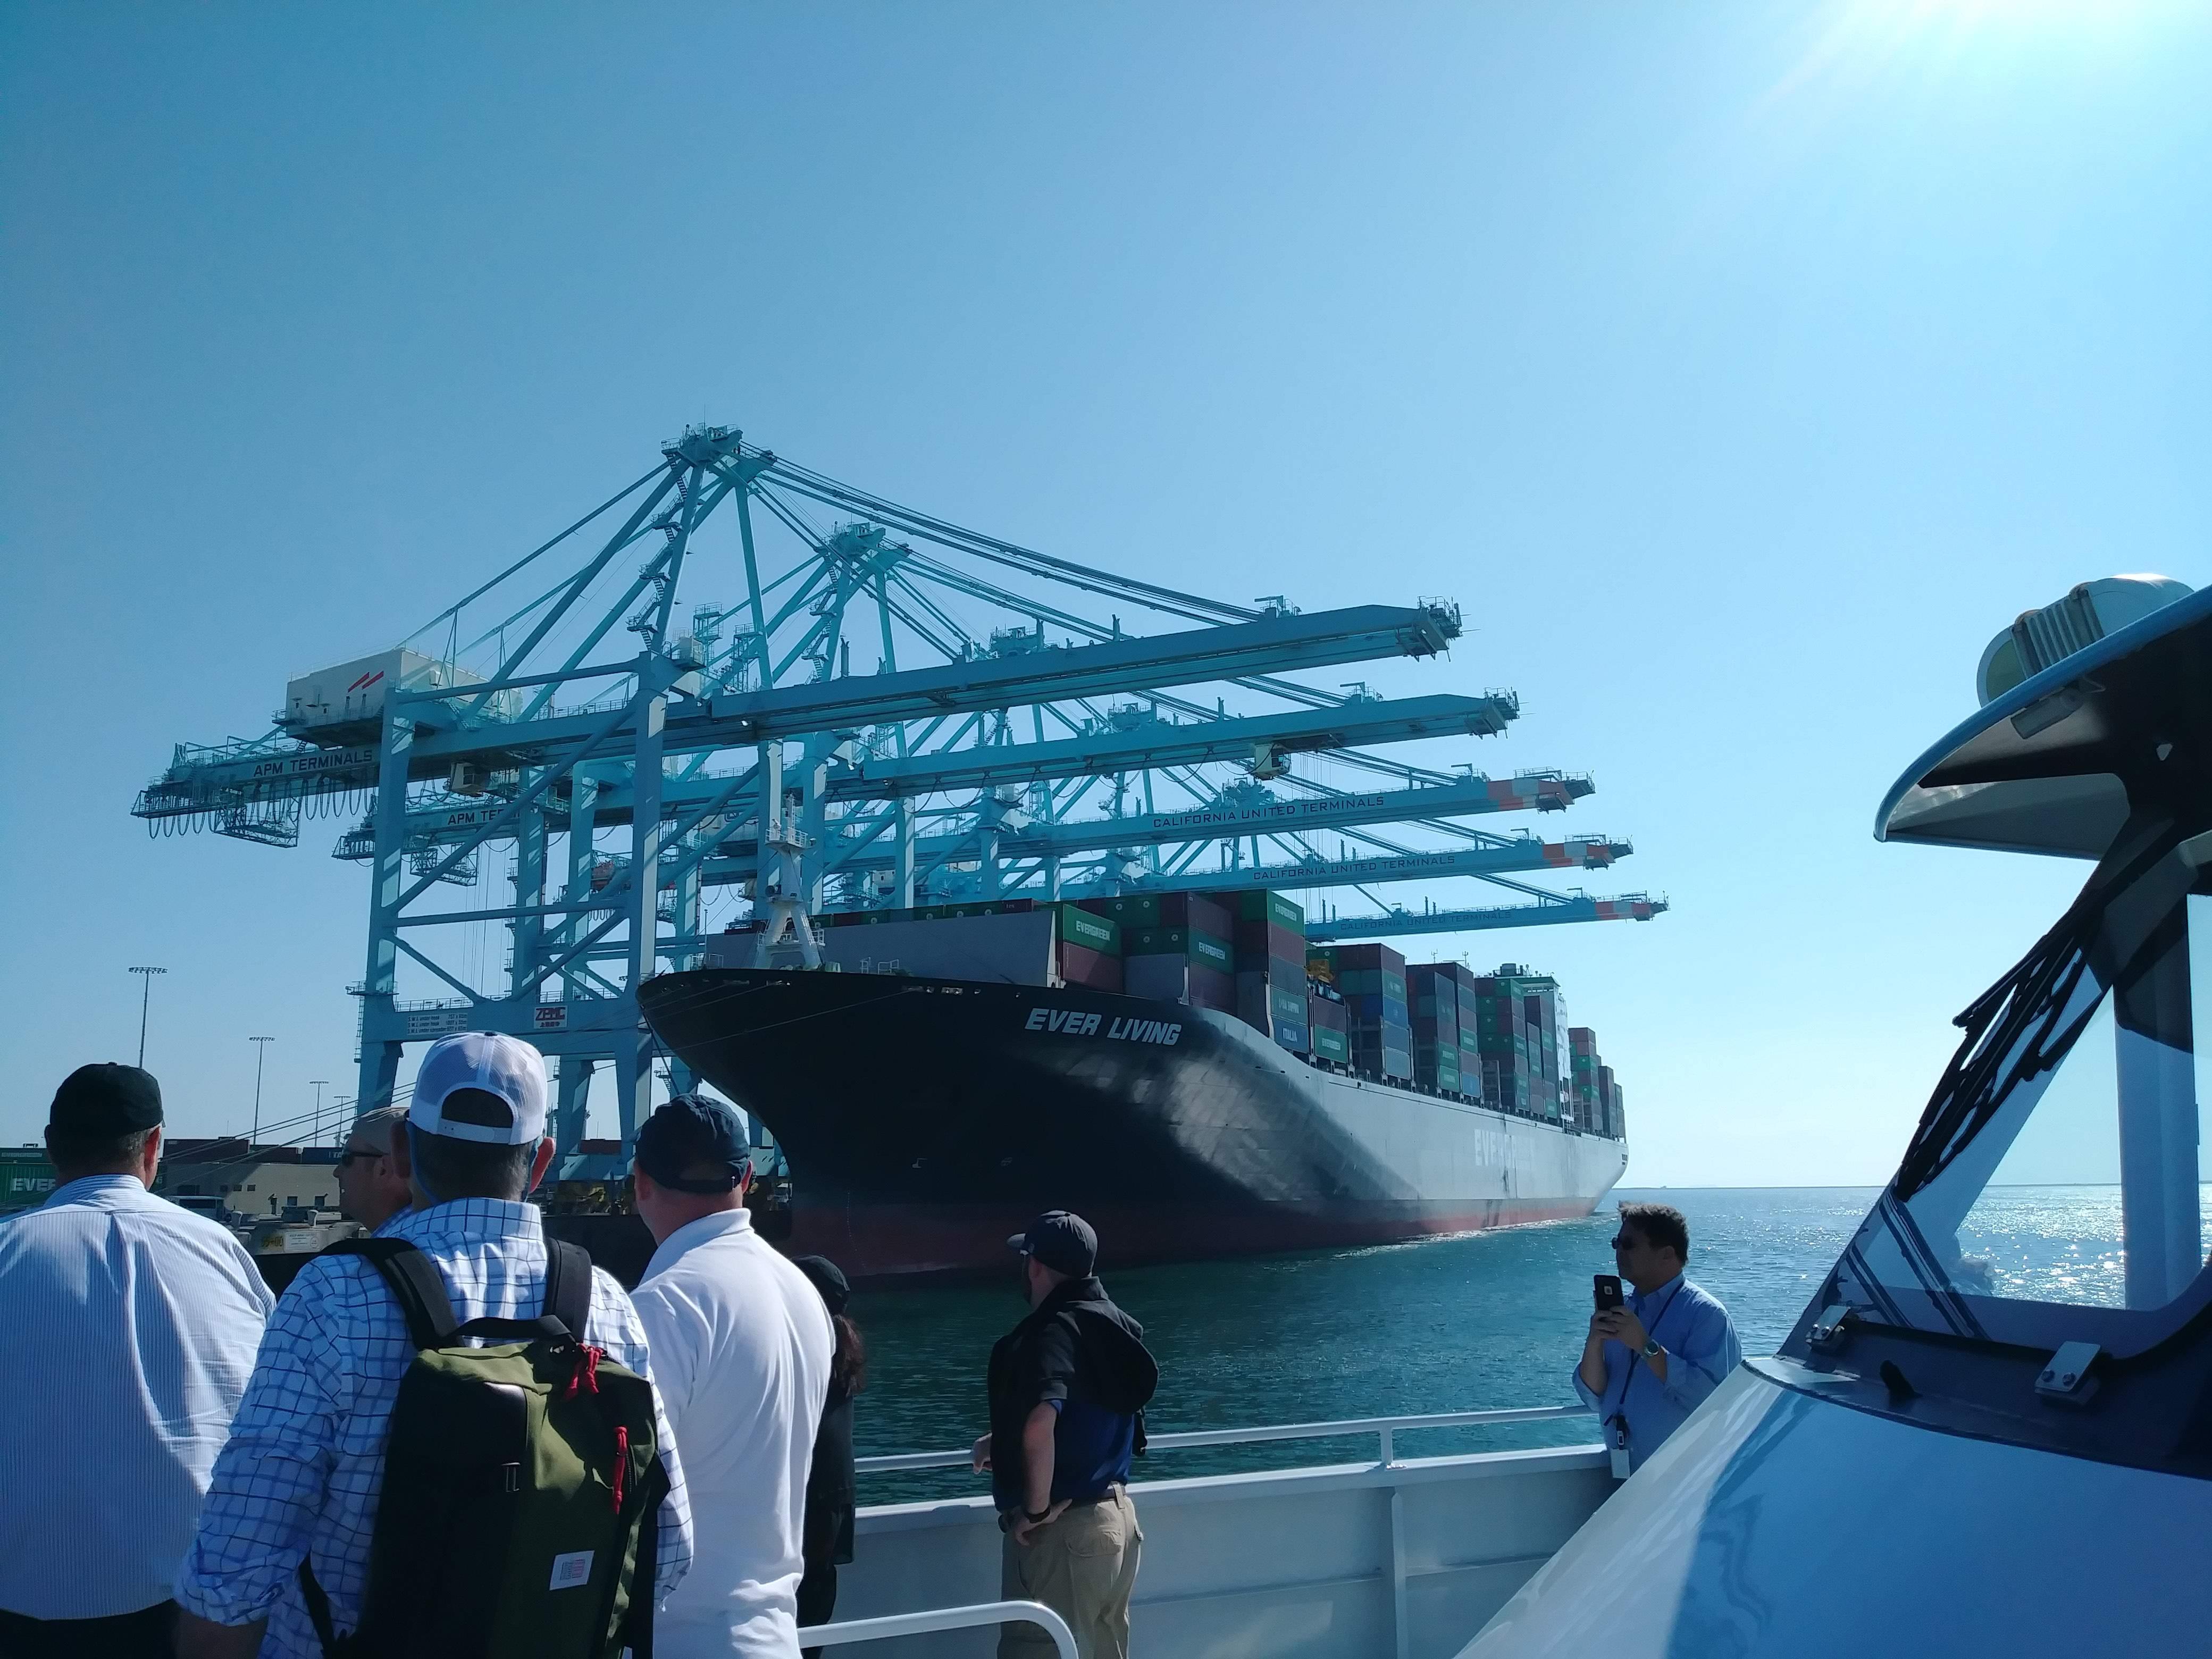 EVERGREEN社が運営するコンテナ船。